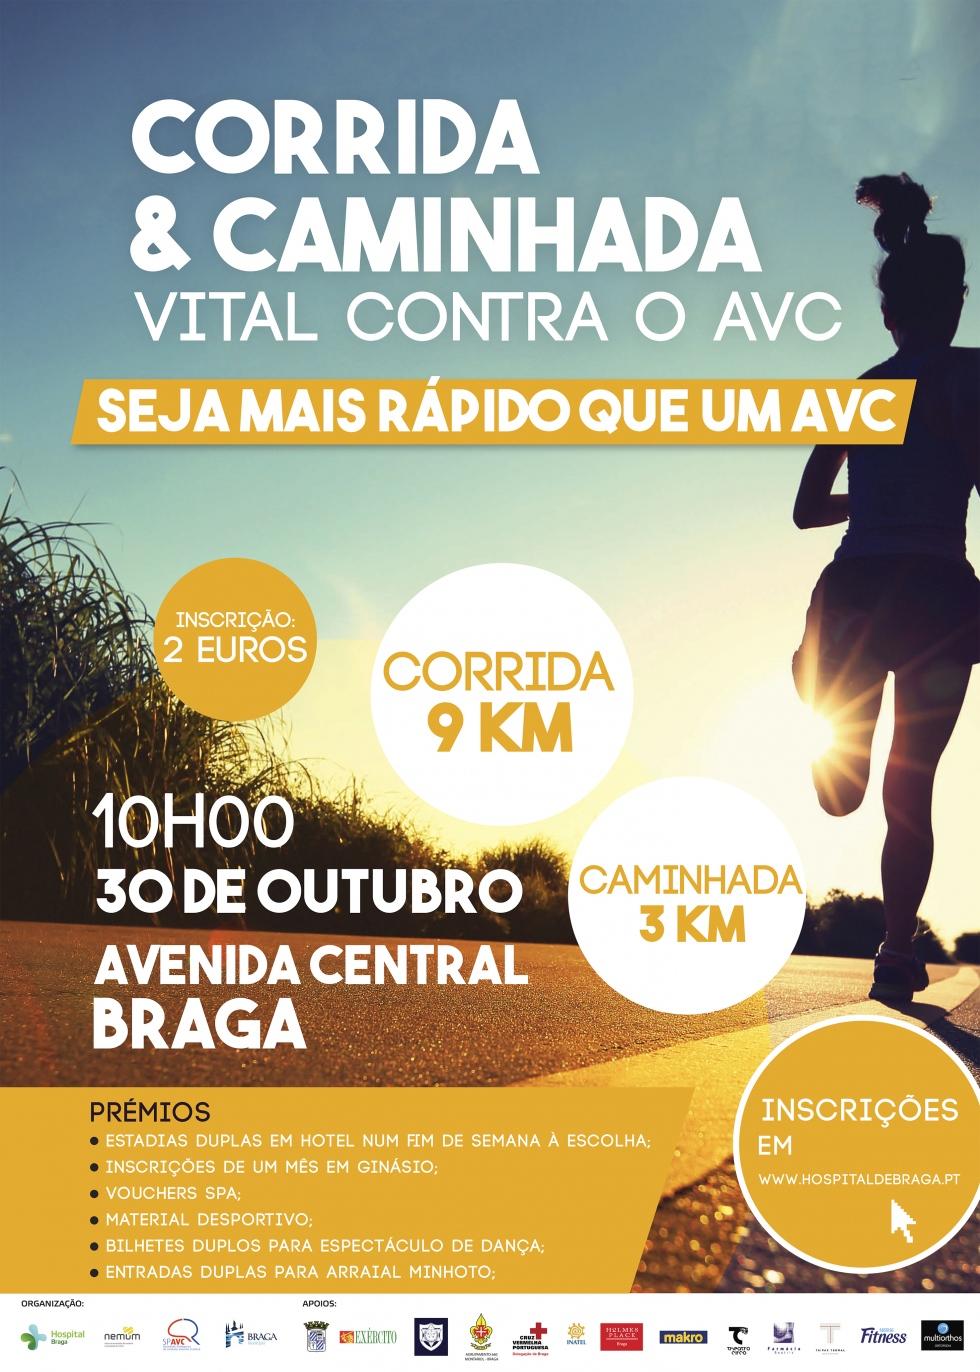 Corrida & Caminhada Vital Contra o AVC